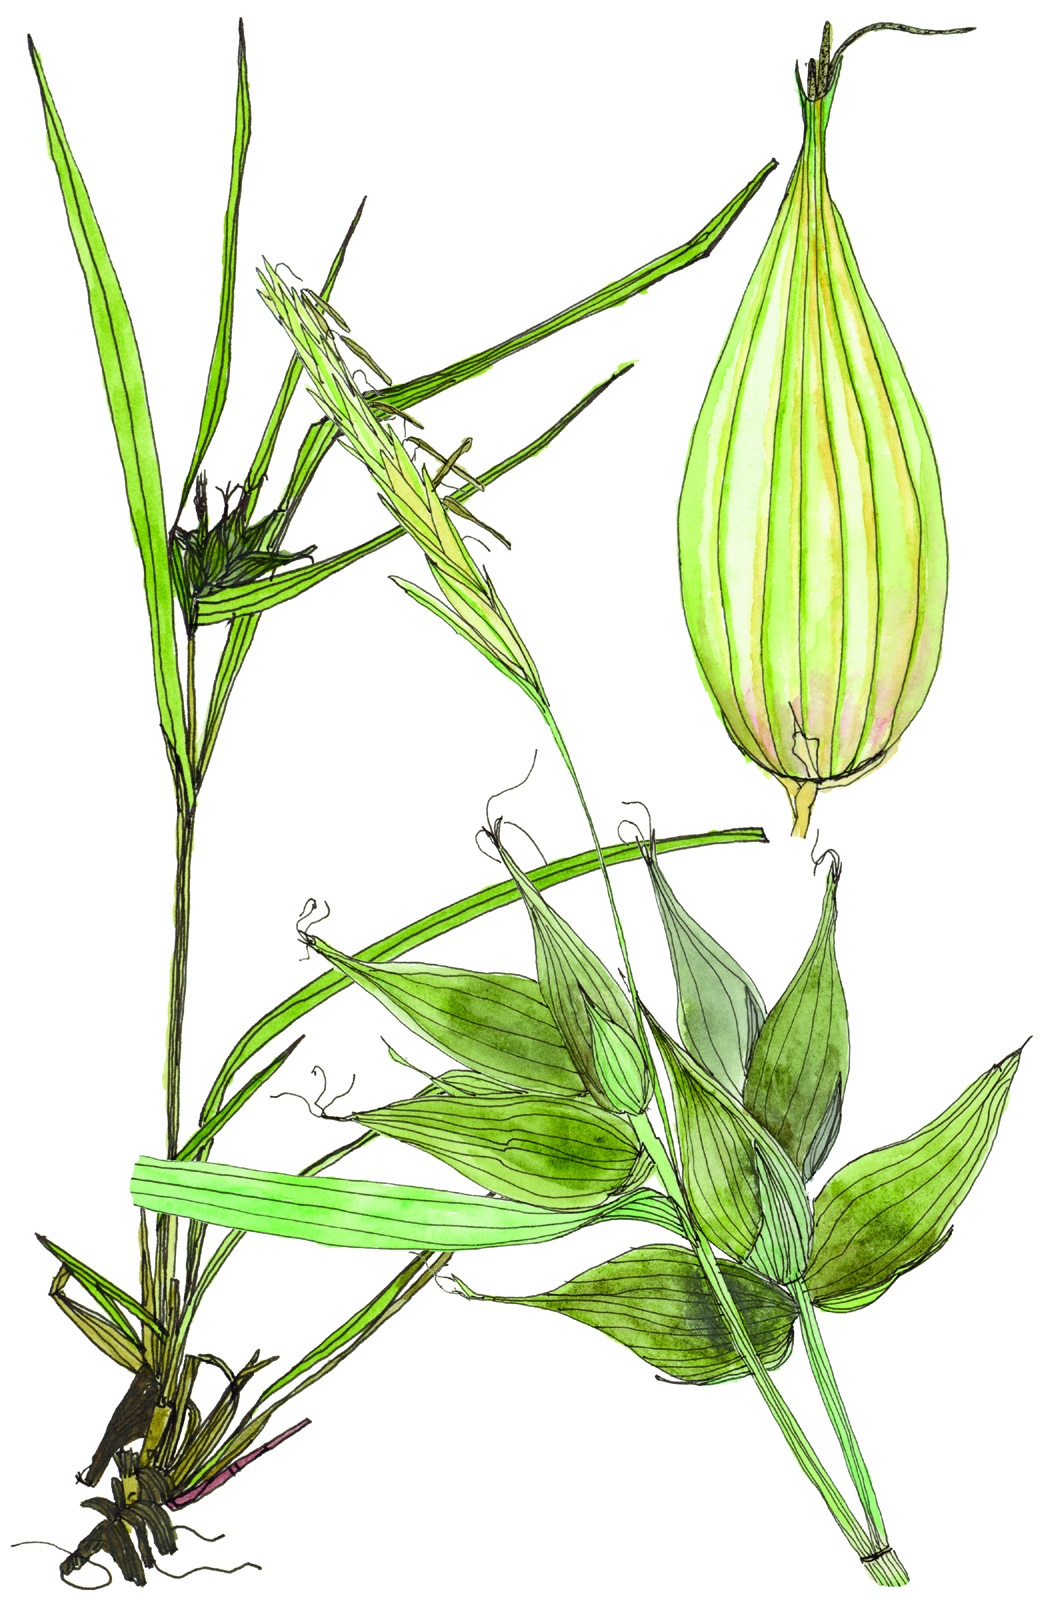 Fig35_Carex_intumescens.jpg